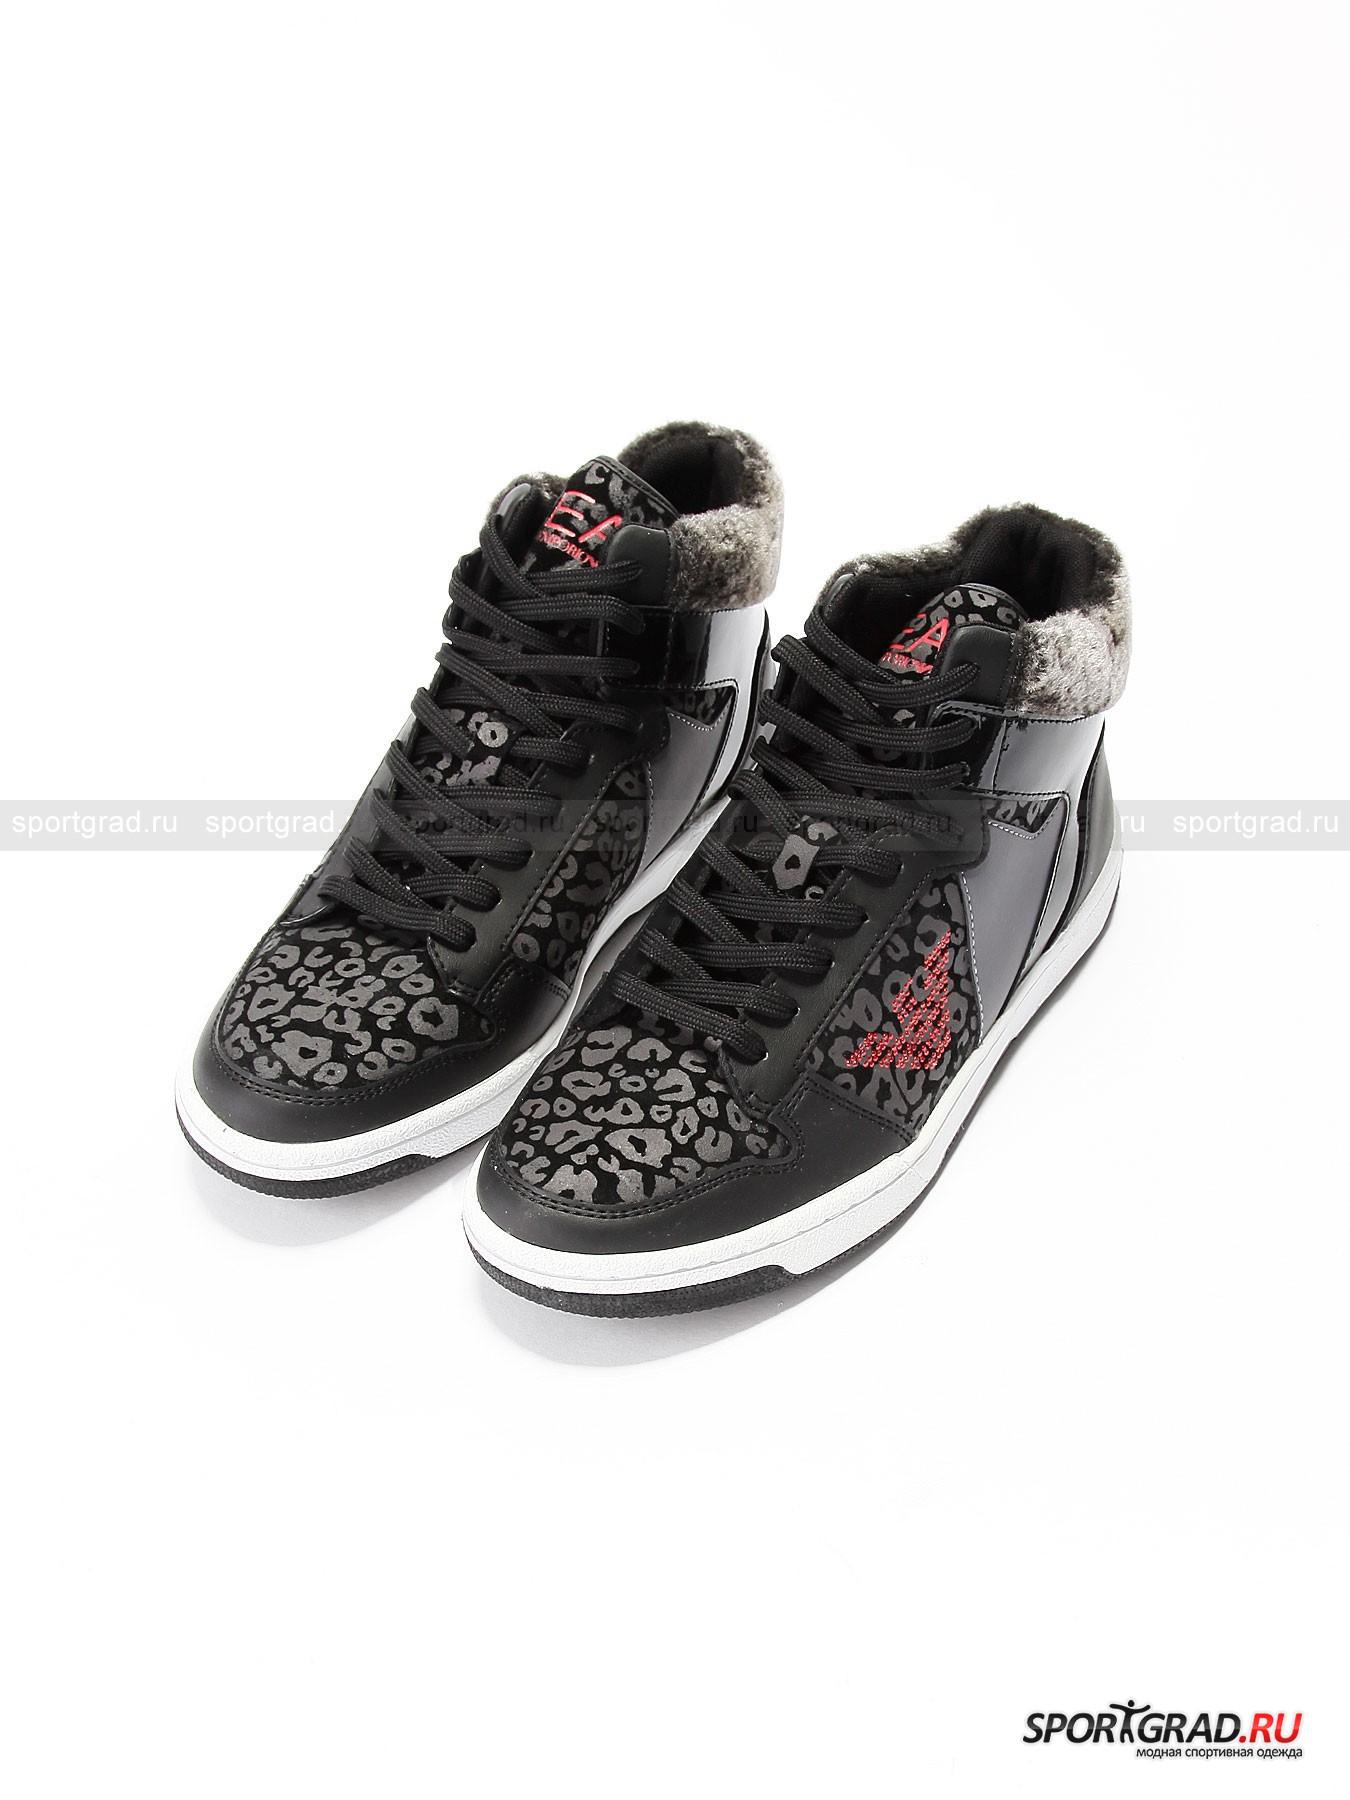 ���� ������� ���������� Lux High W Shoes EMPORIO ARMANI